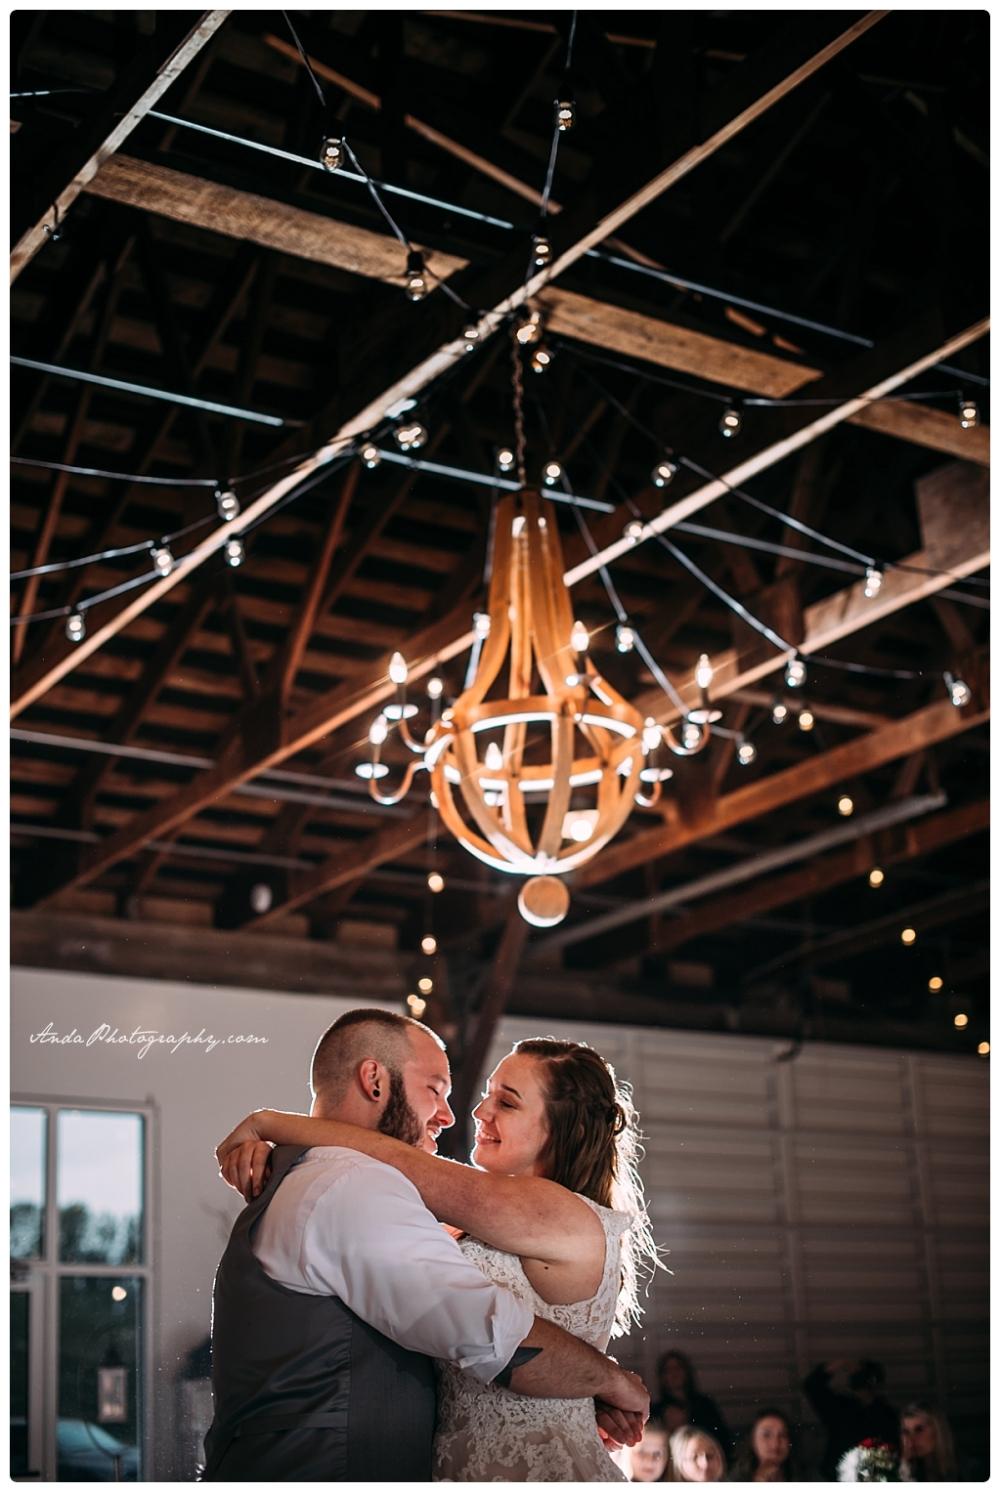 Anda Photography Bellingham wedding photography Bellingham lifestyle wedding photographer Maplehurst Farms_0089